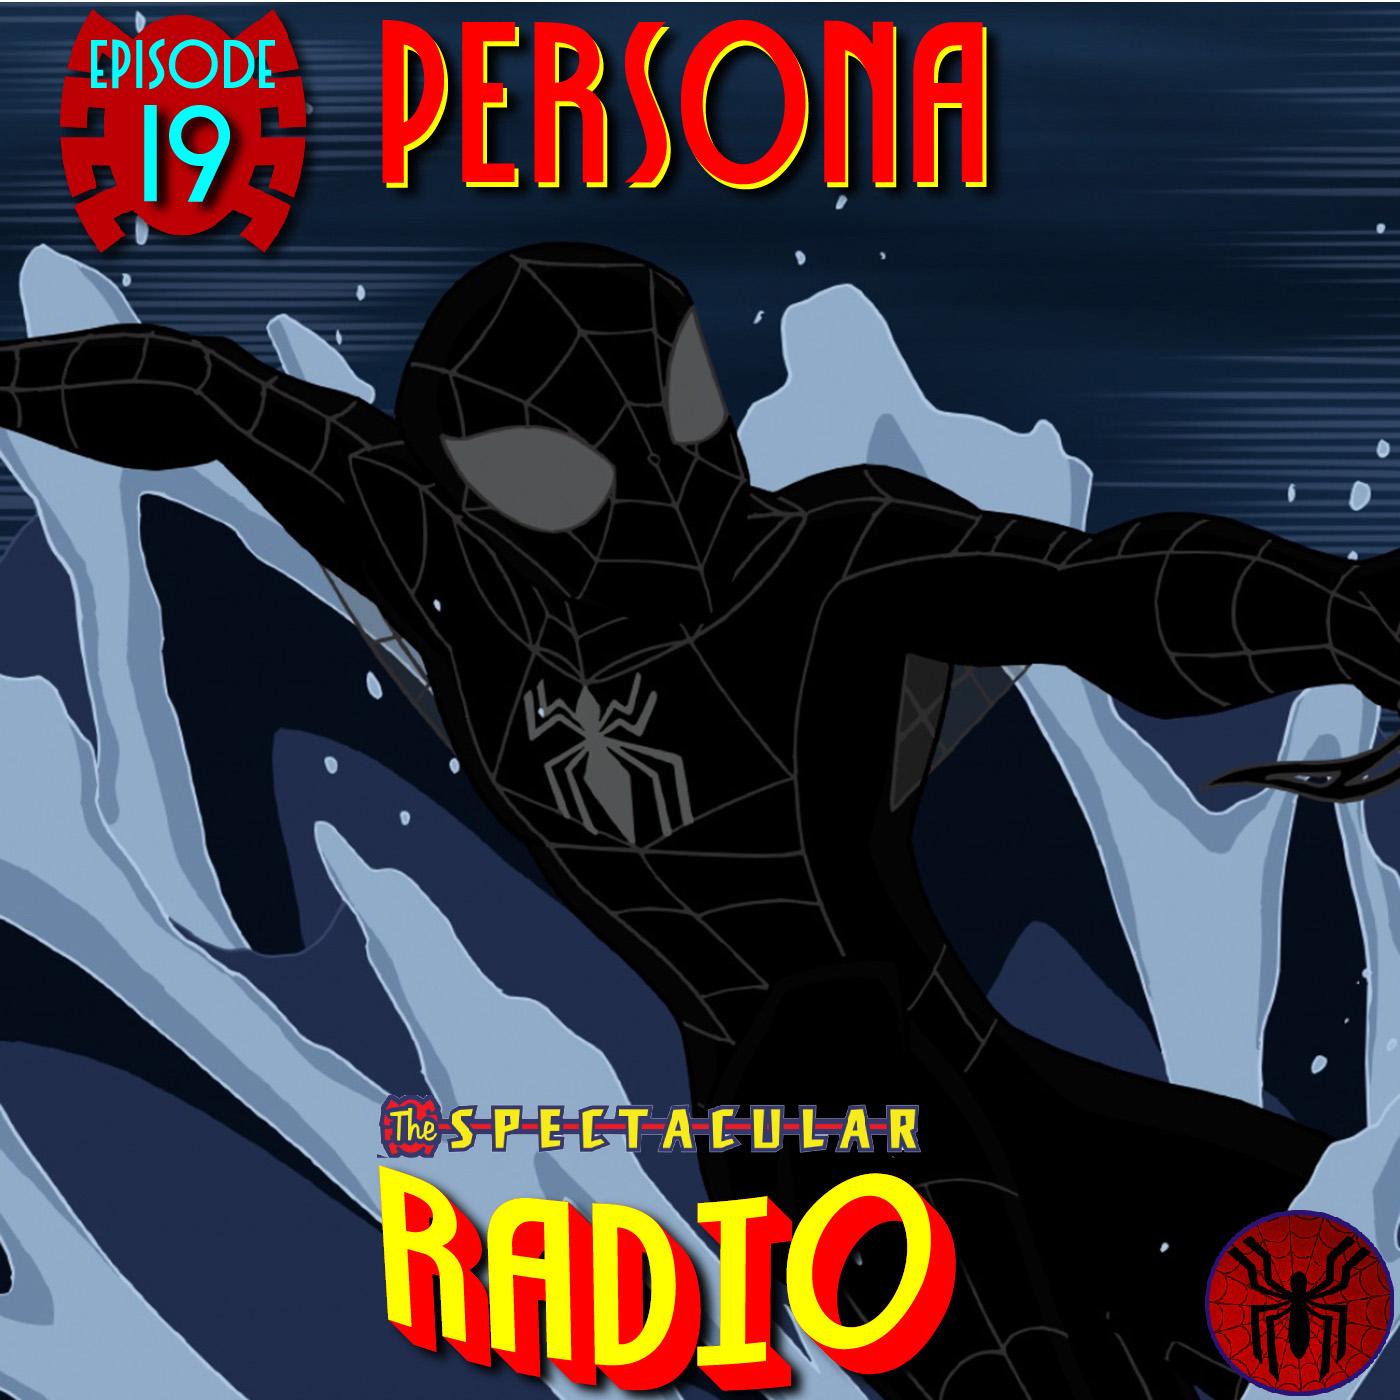 "Spectacular Radio Episode 19: ""Persona"" With Greg Weisman"